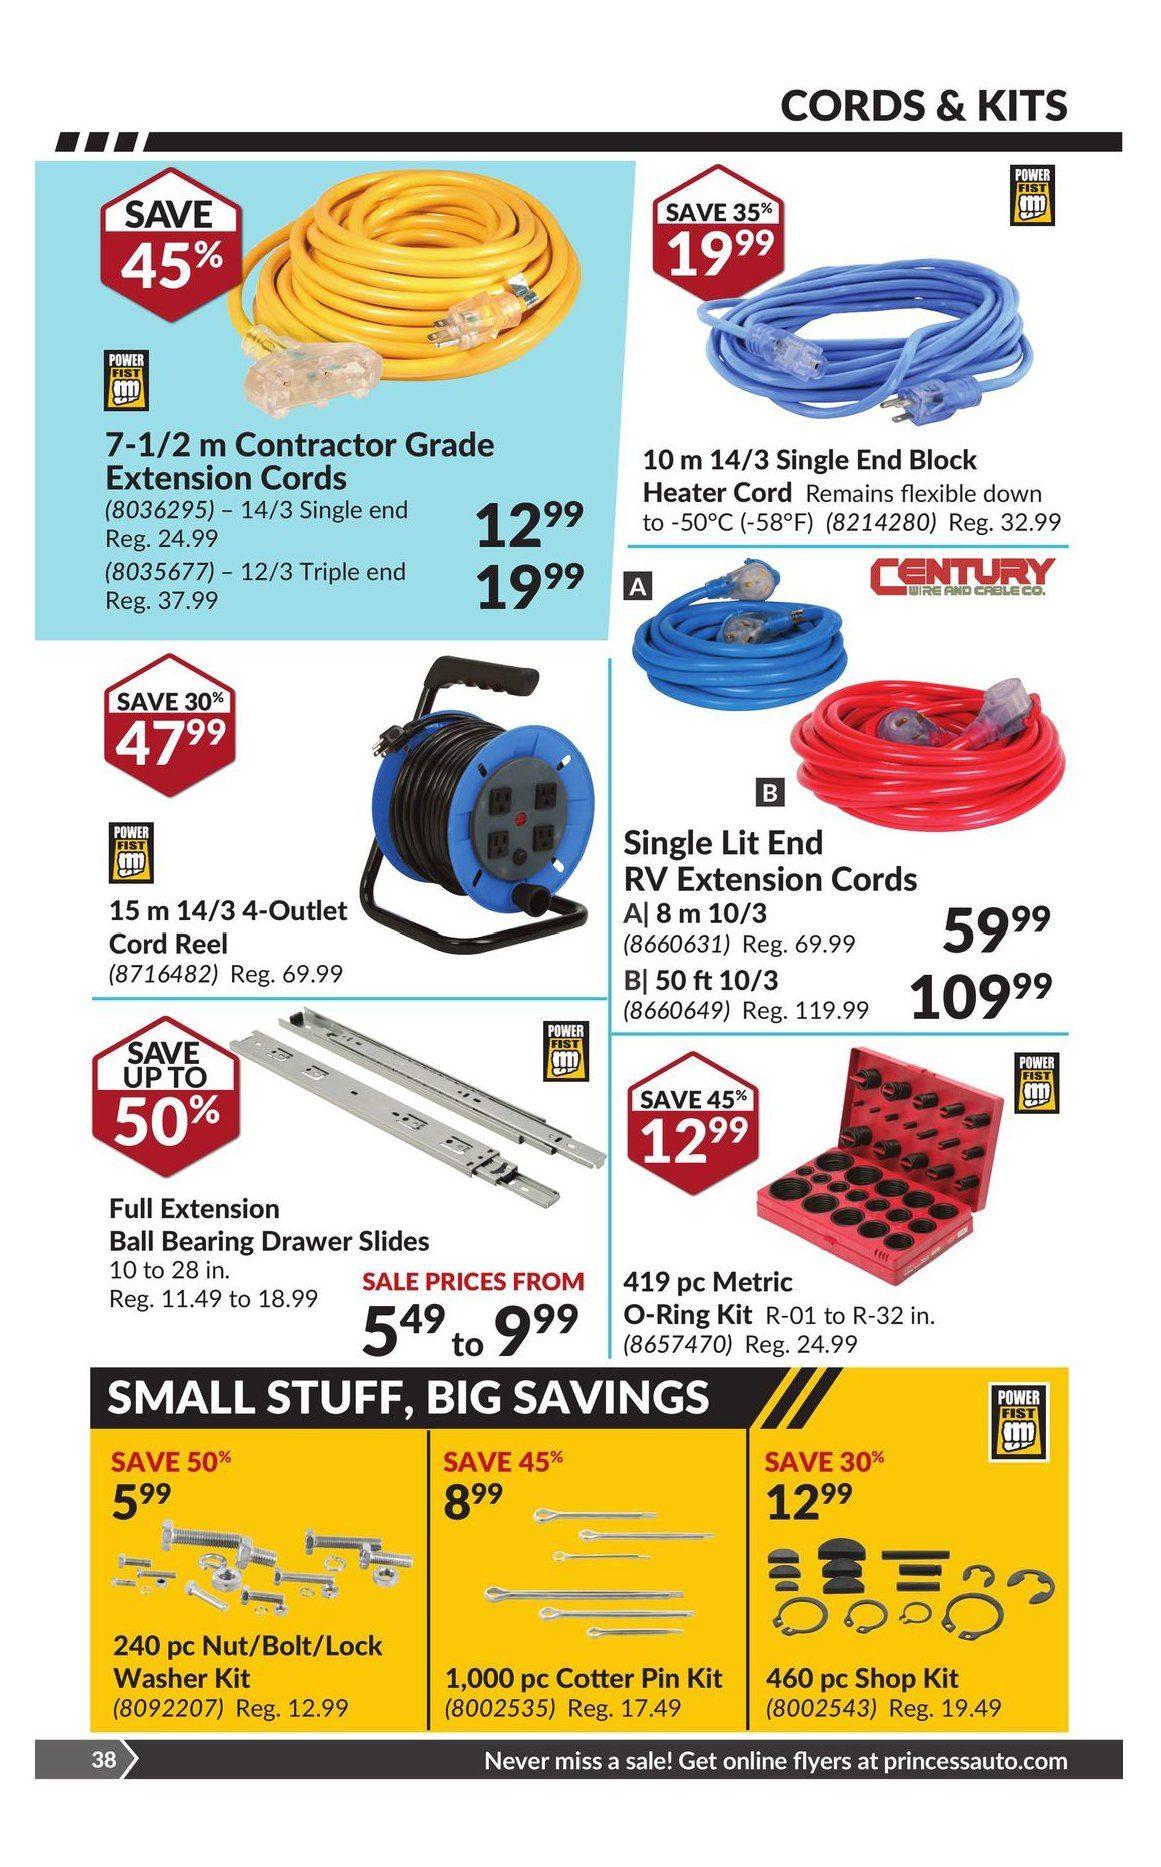 Princess Auto Weekly Flyer - Summer Garage Sale - Aug 7 – 19